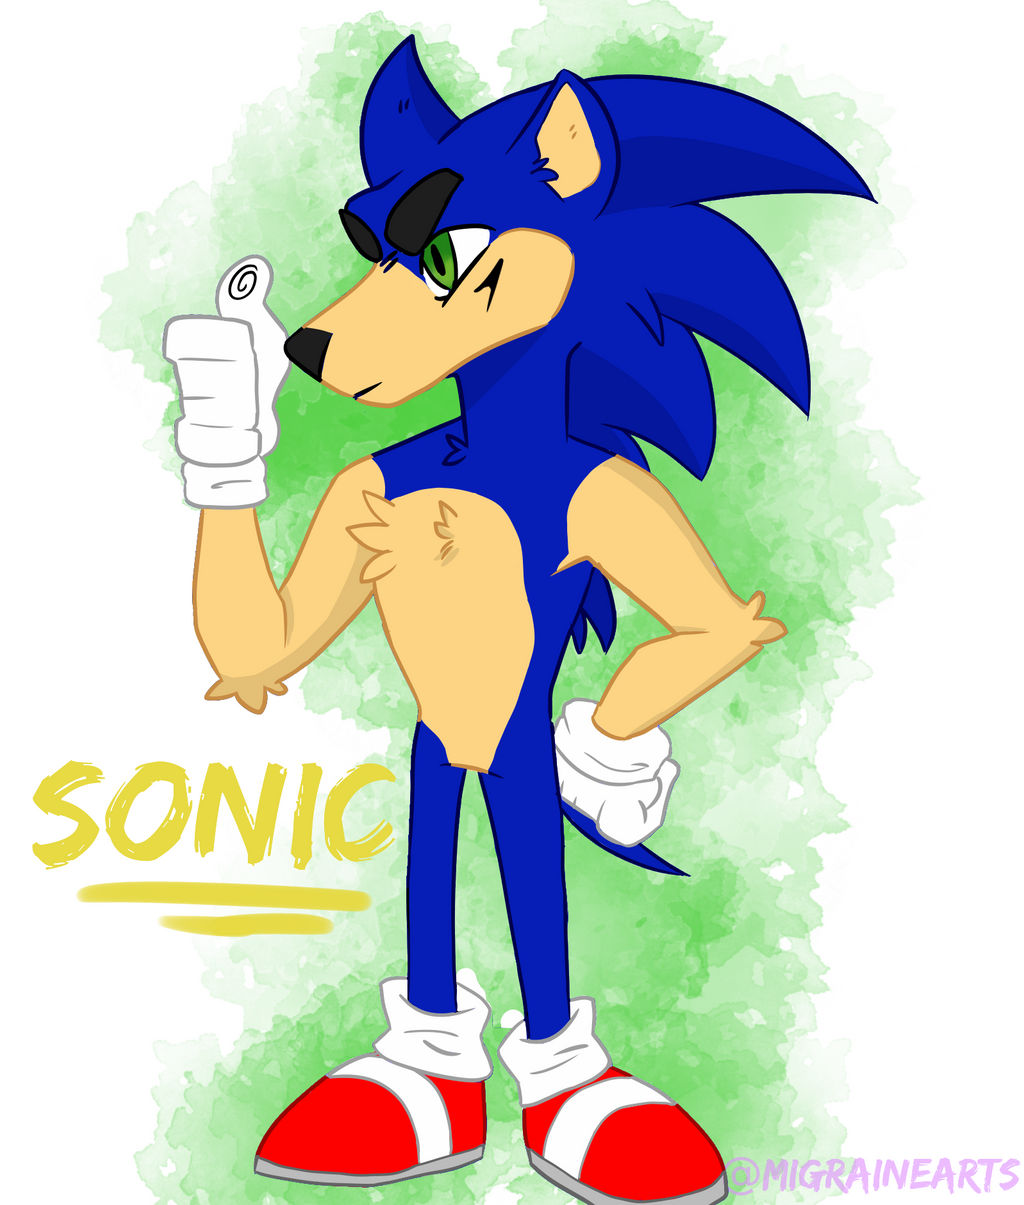 Sonic The Hedgehog Fanart By Migrainearts On Deviantart